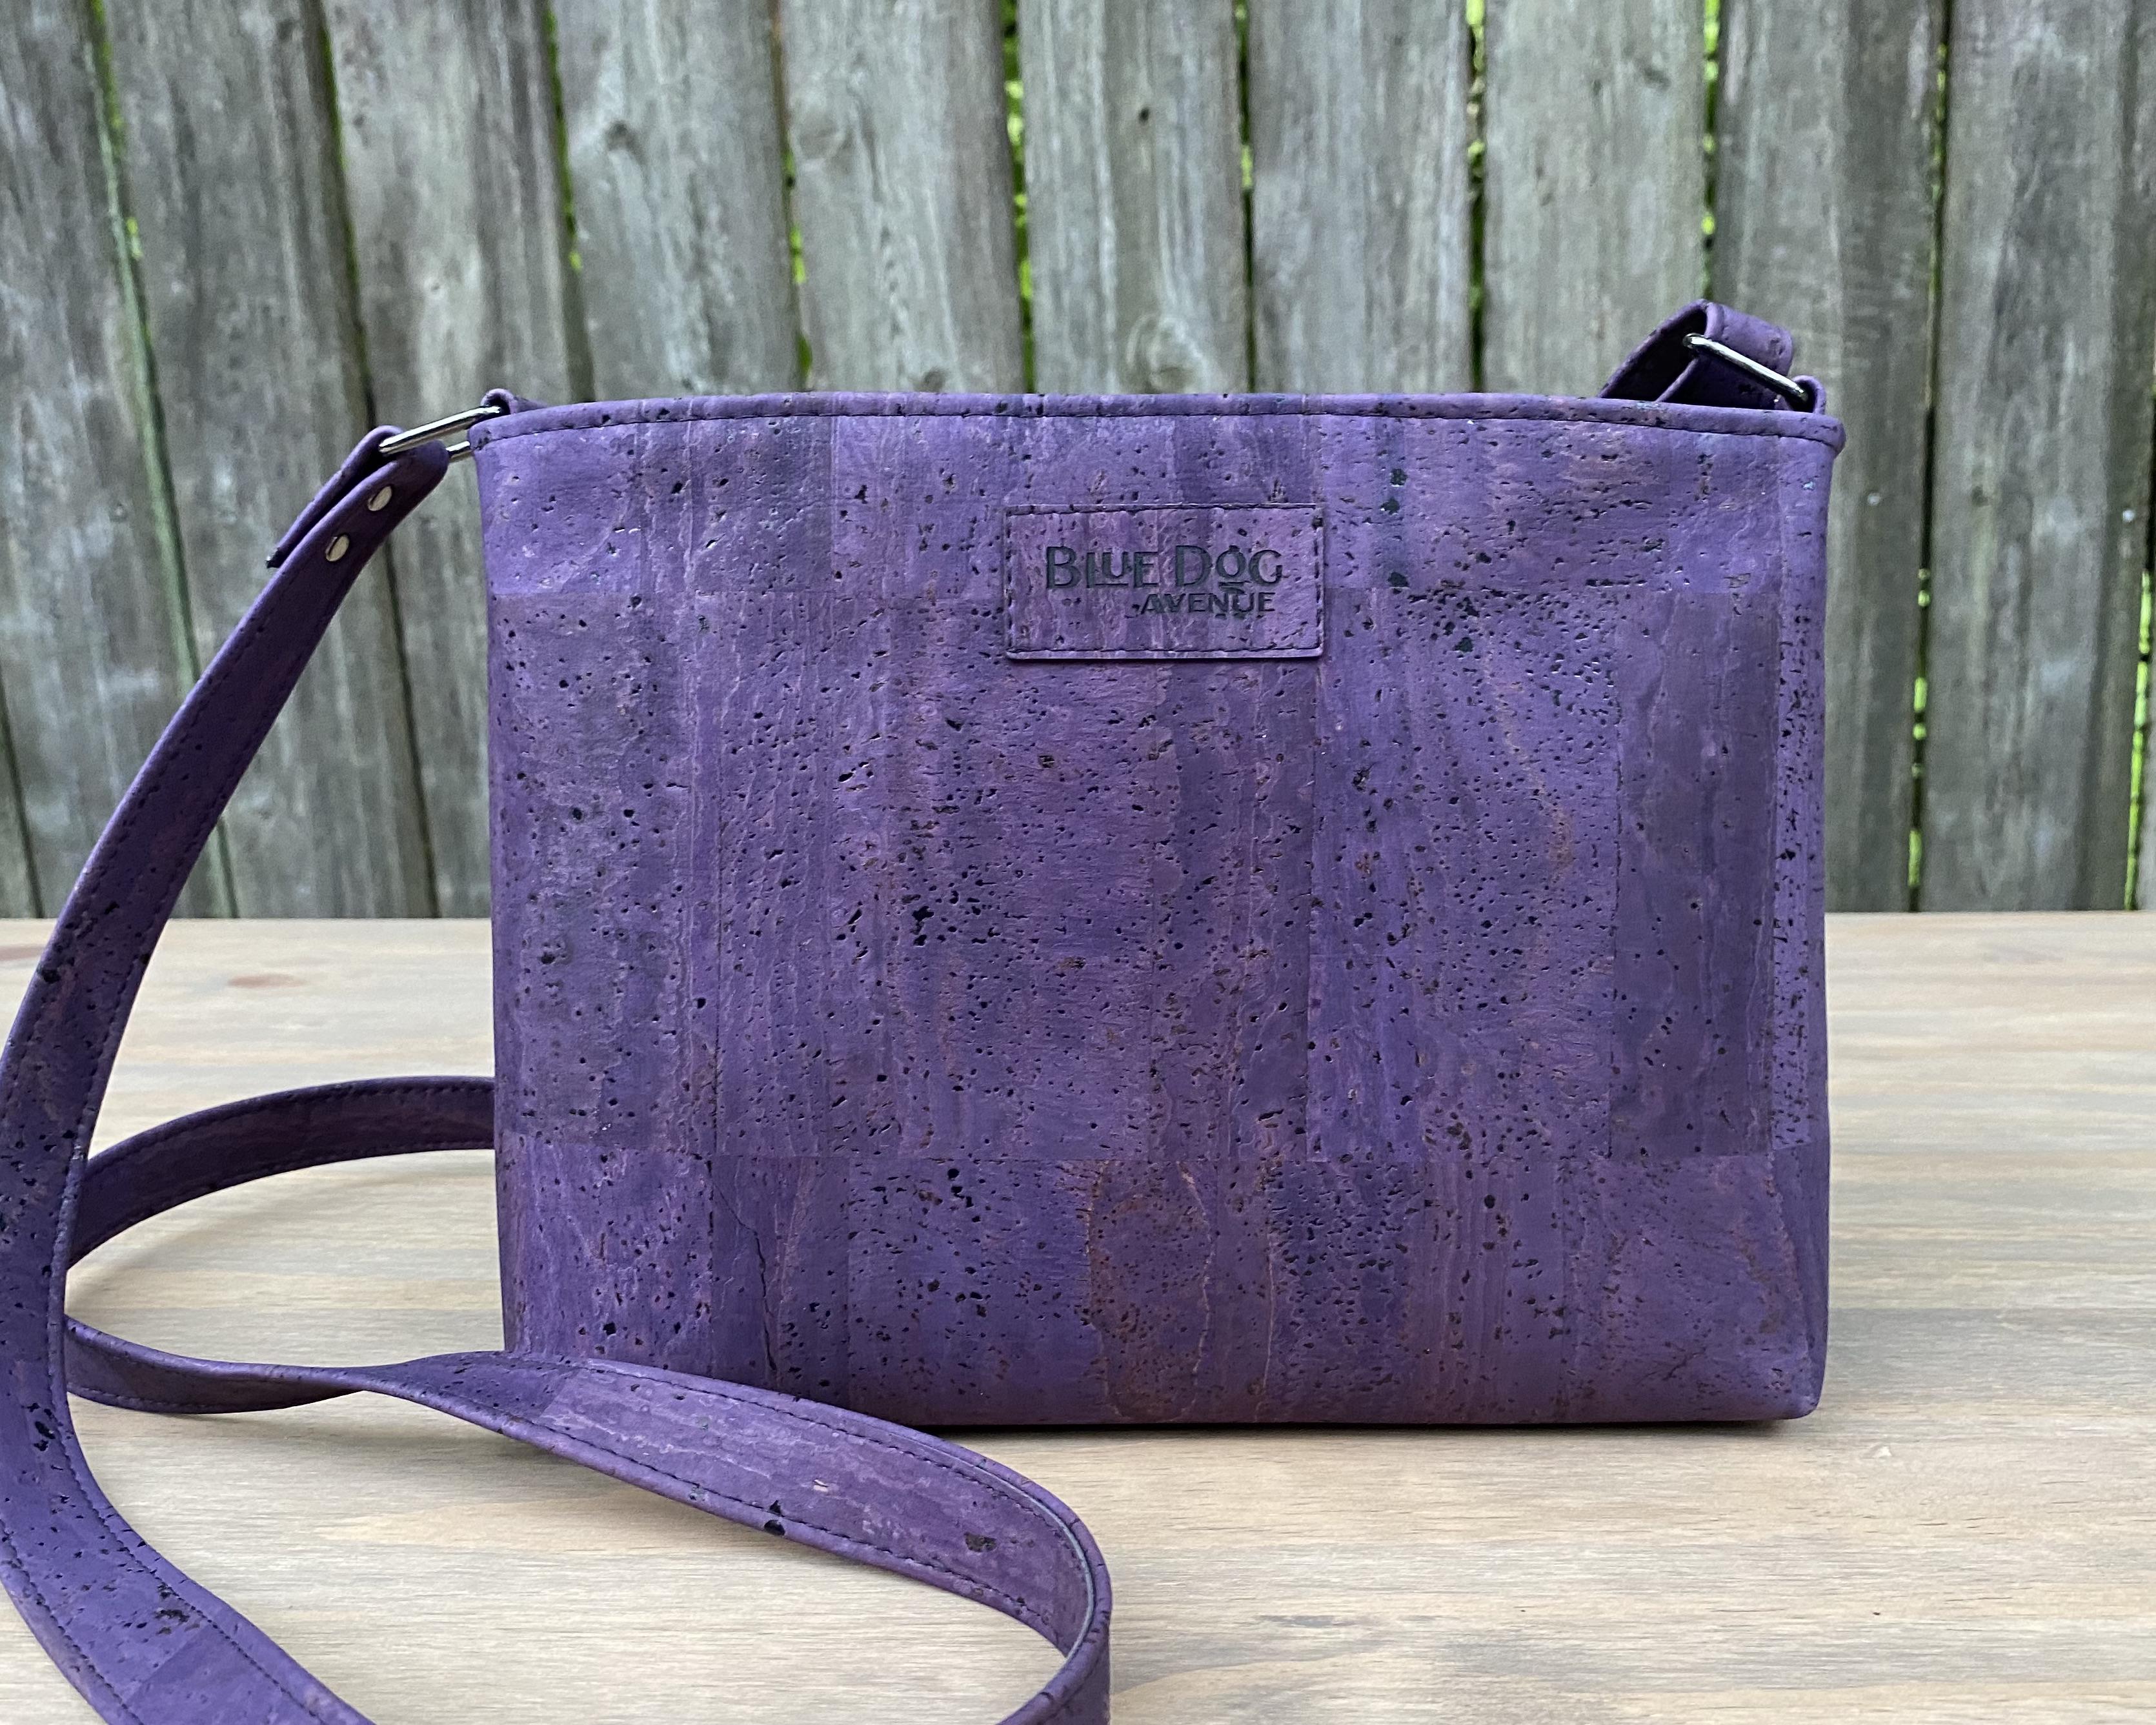 Custom Designed Purple Cork Leather Everyday Purse by Blue Dog Avenue